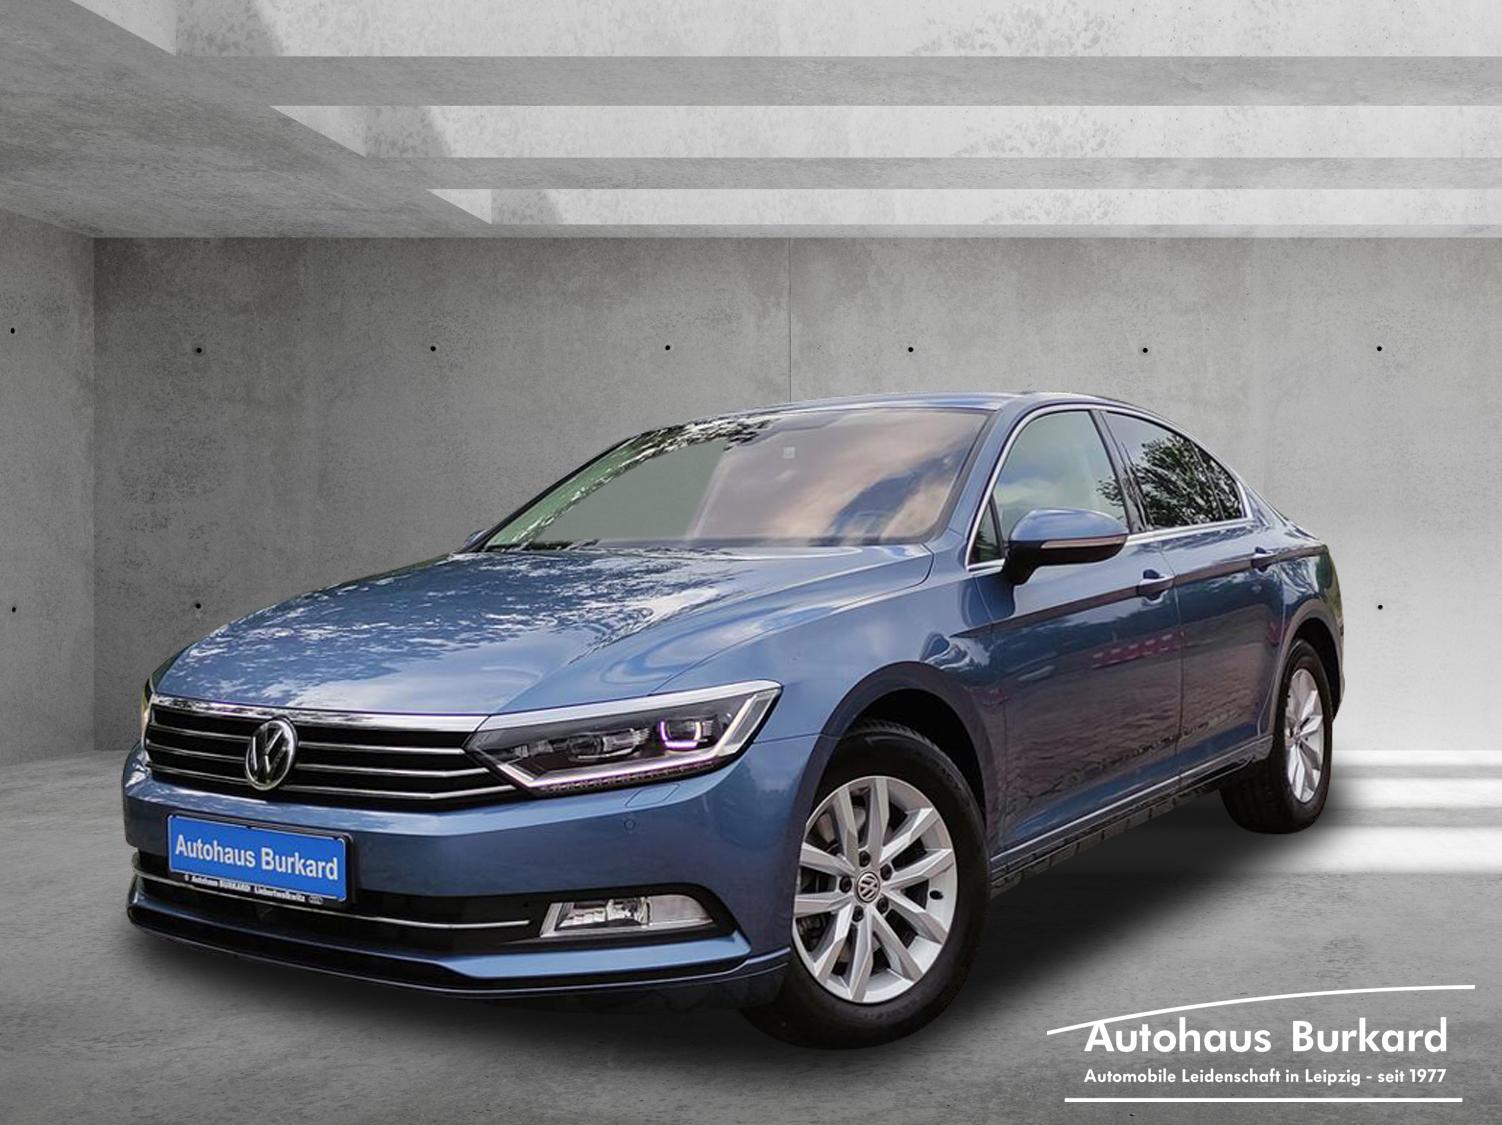 Volkswagen Passat Lim. Comfortl. 1.4 TSI+DAB+DSG+RÃckfahrk., Jahr 2018, Benzin